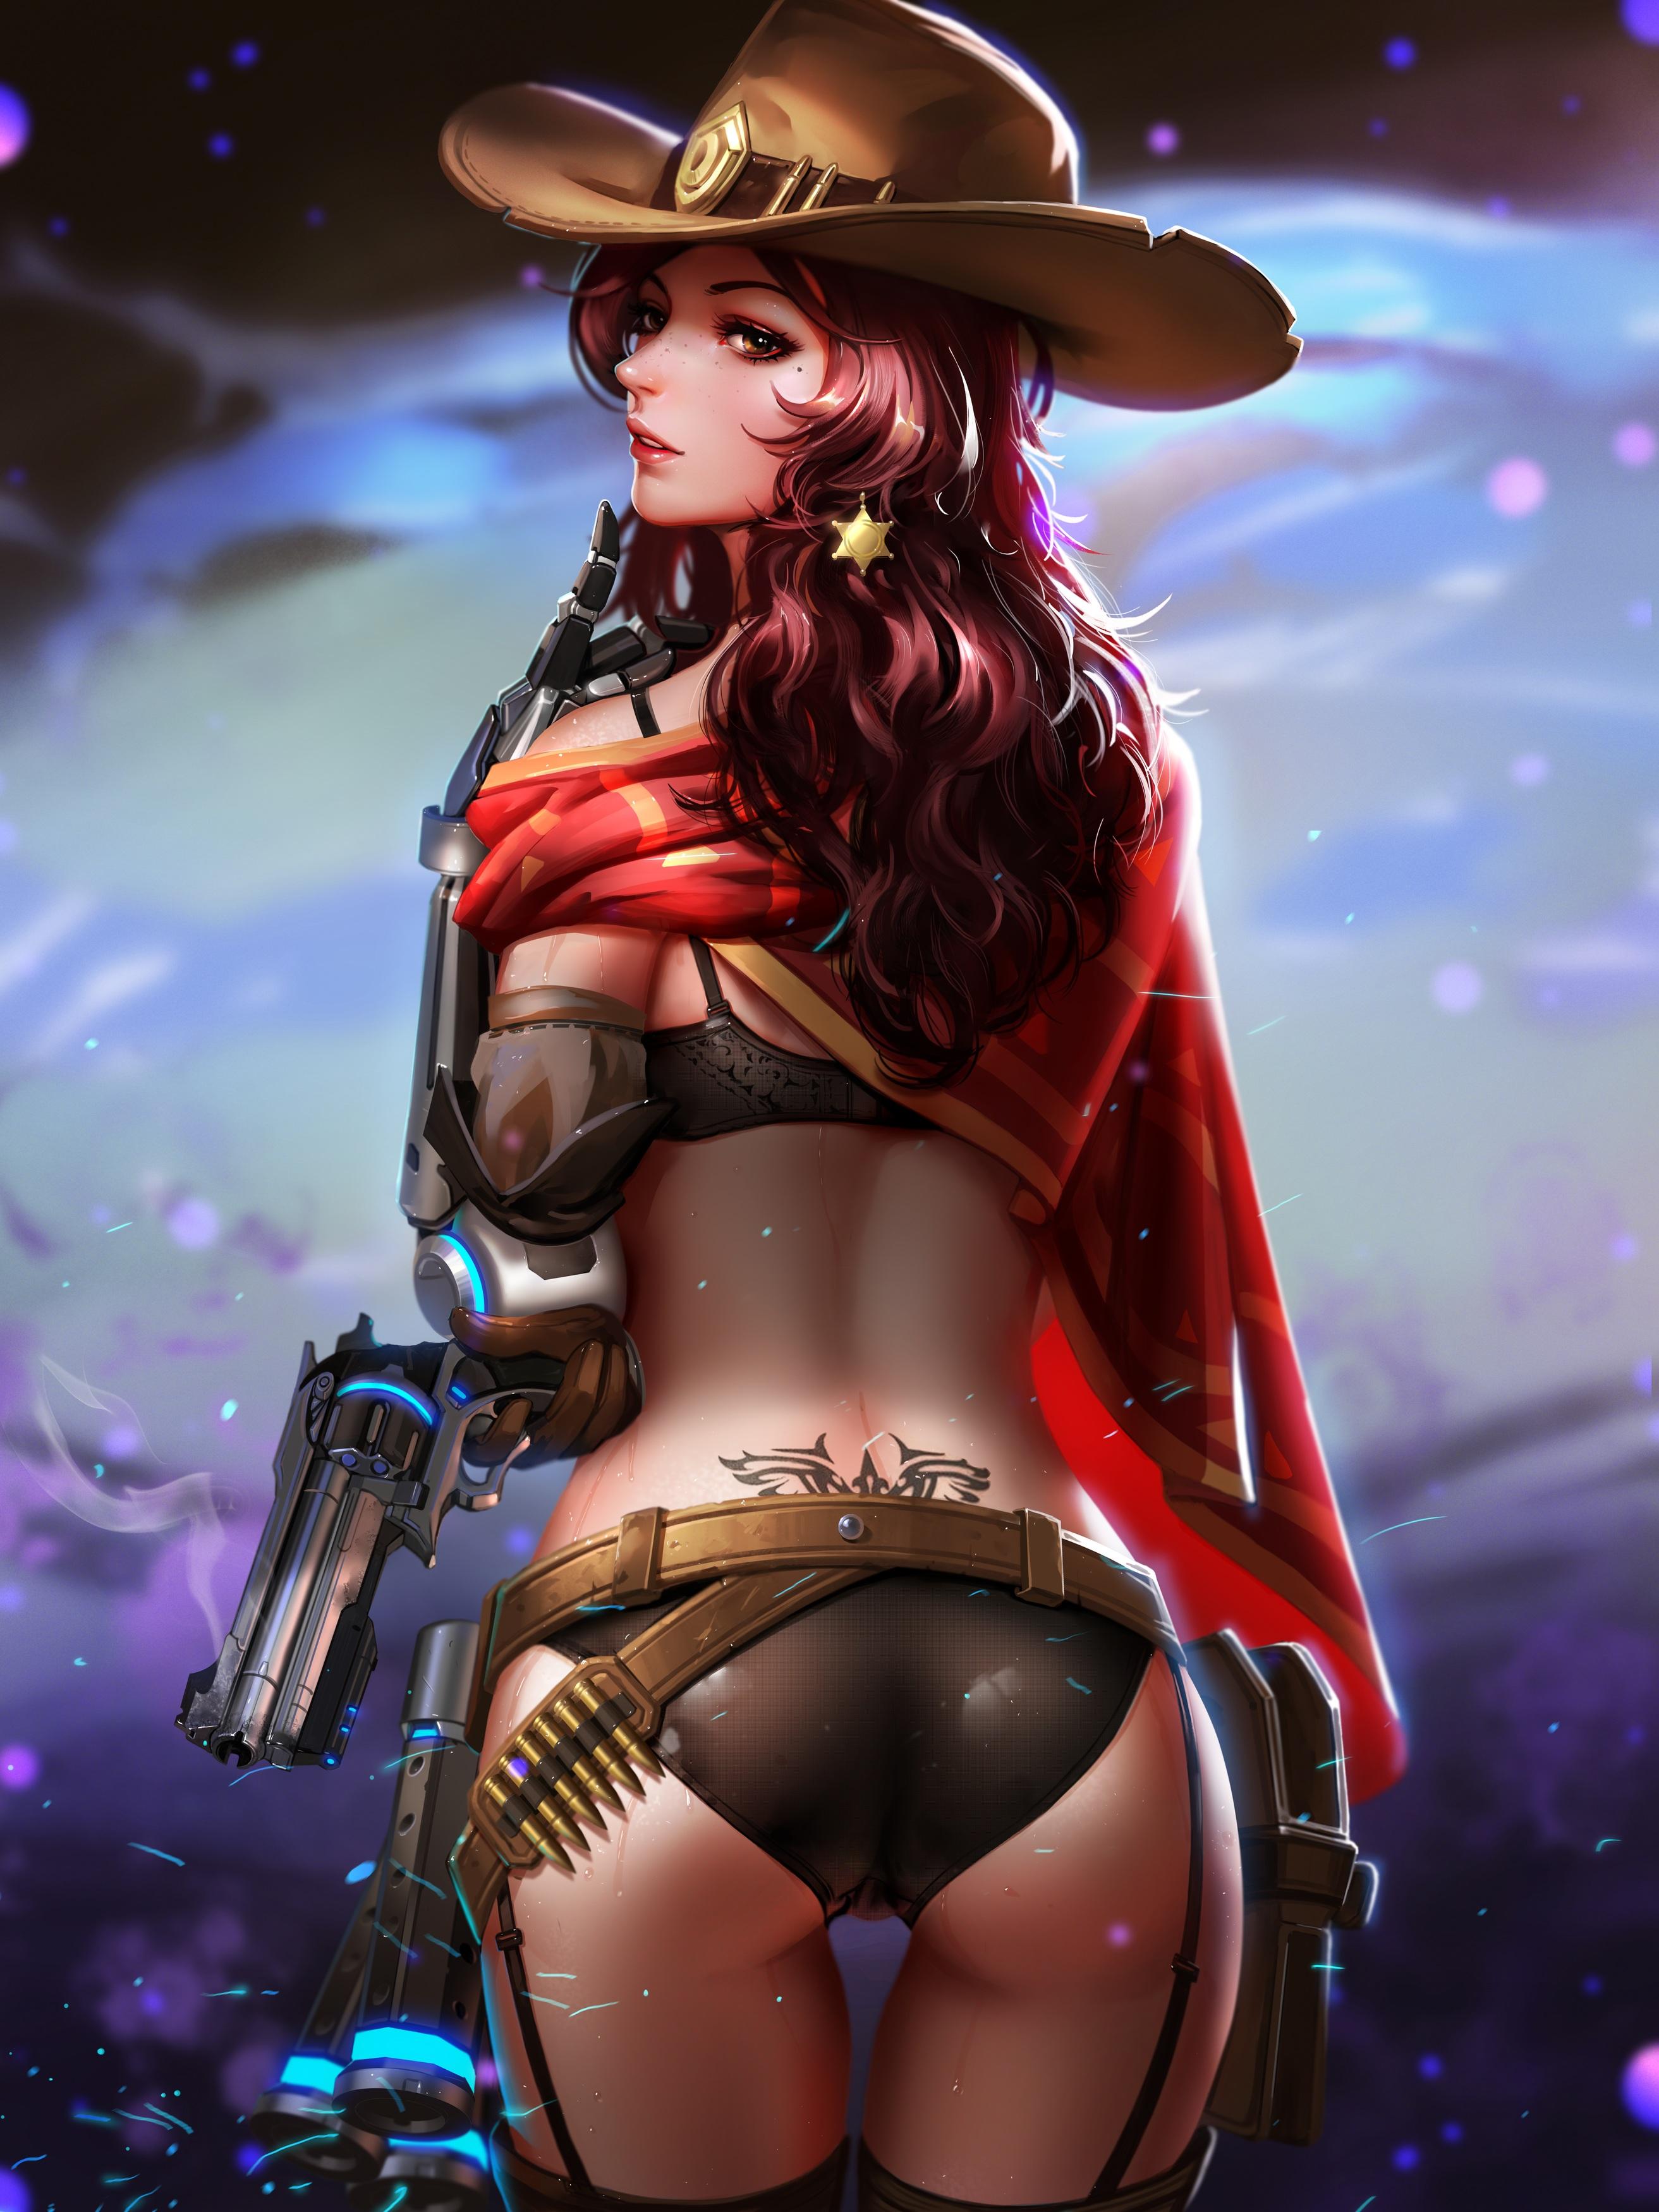 Anime 2625x3500 ass Liang-Xing dress bra genderswap gun Mc Cree Overwatch stockings tattoo thigh-highs realistic the gap